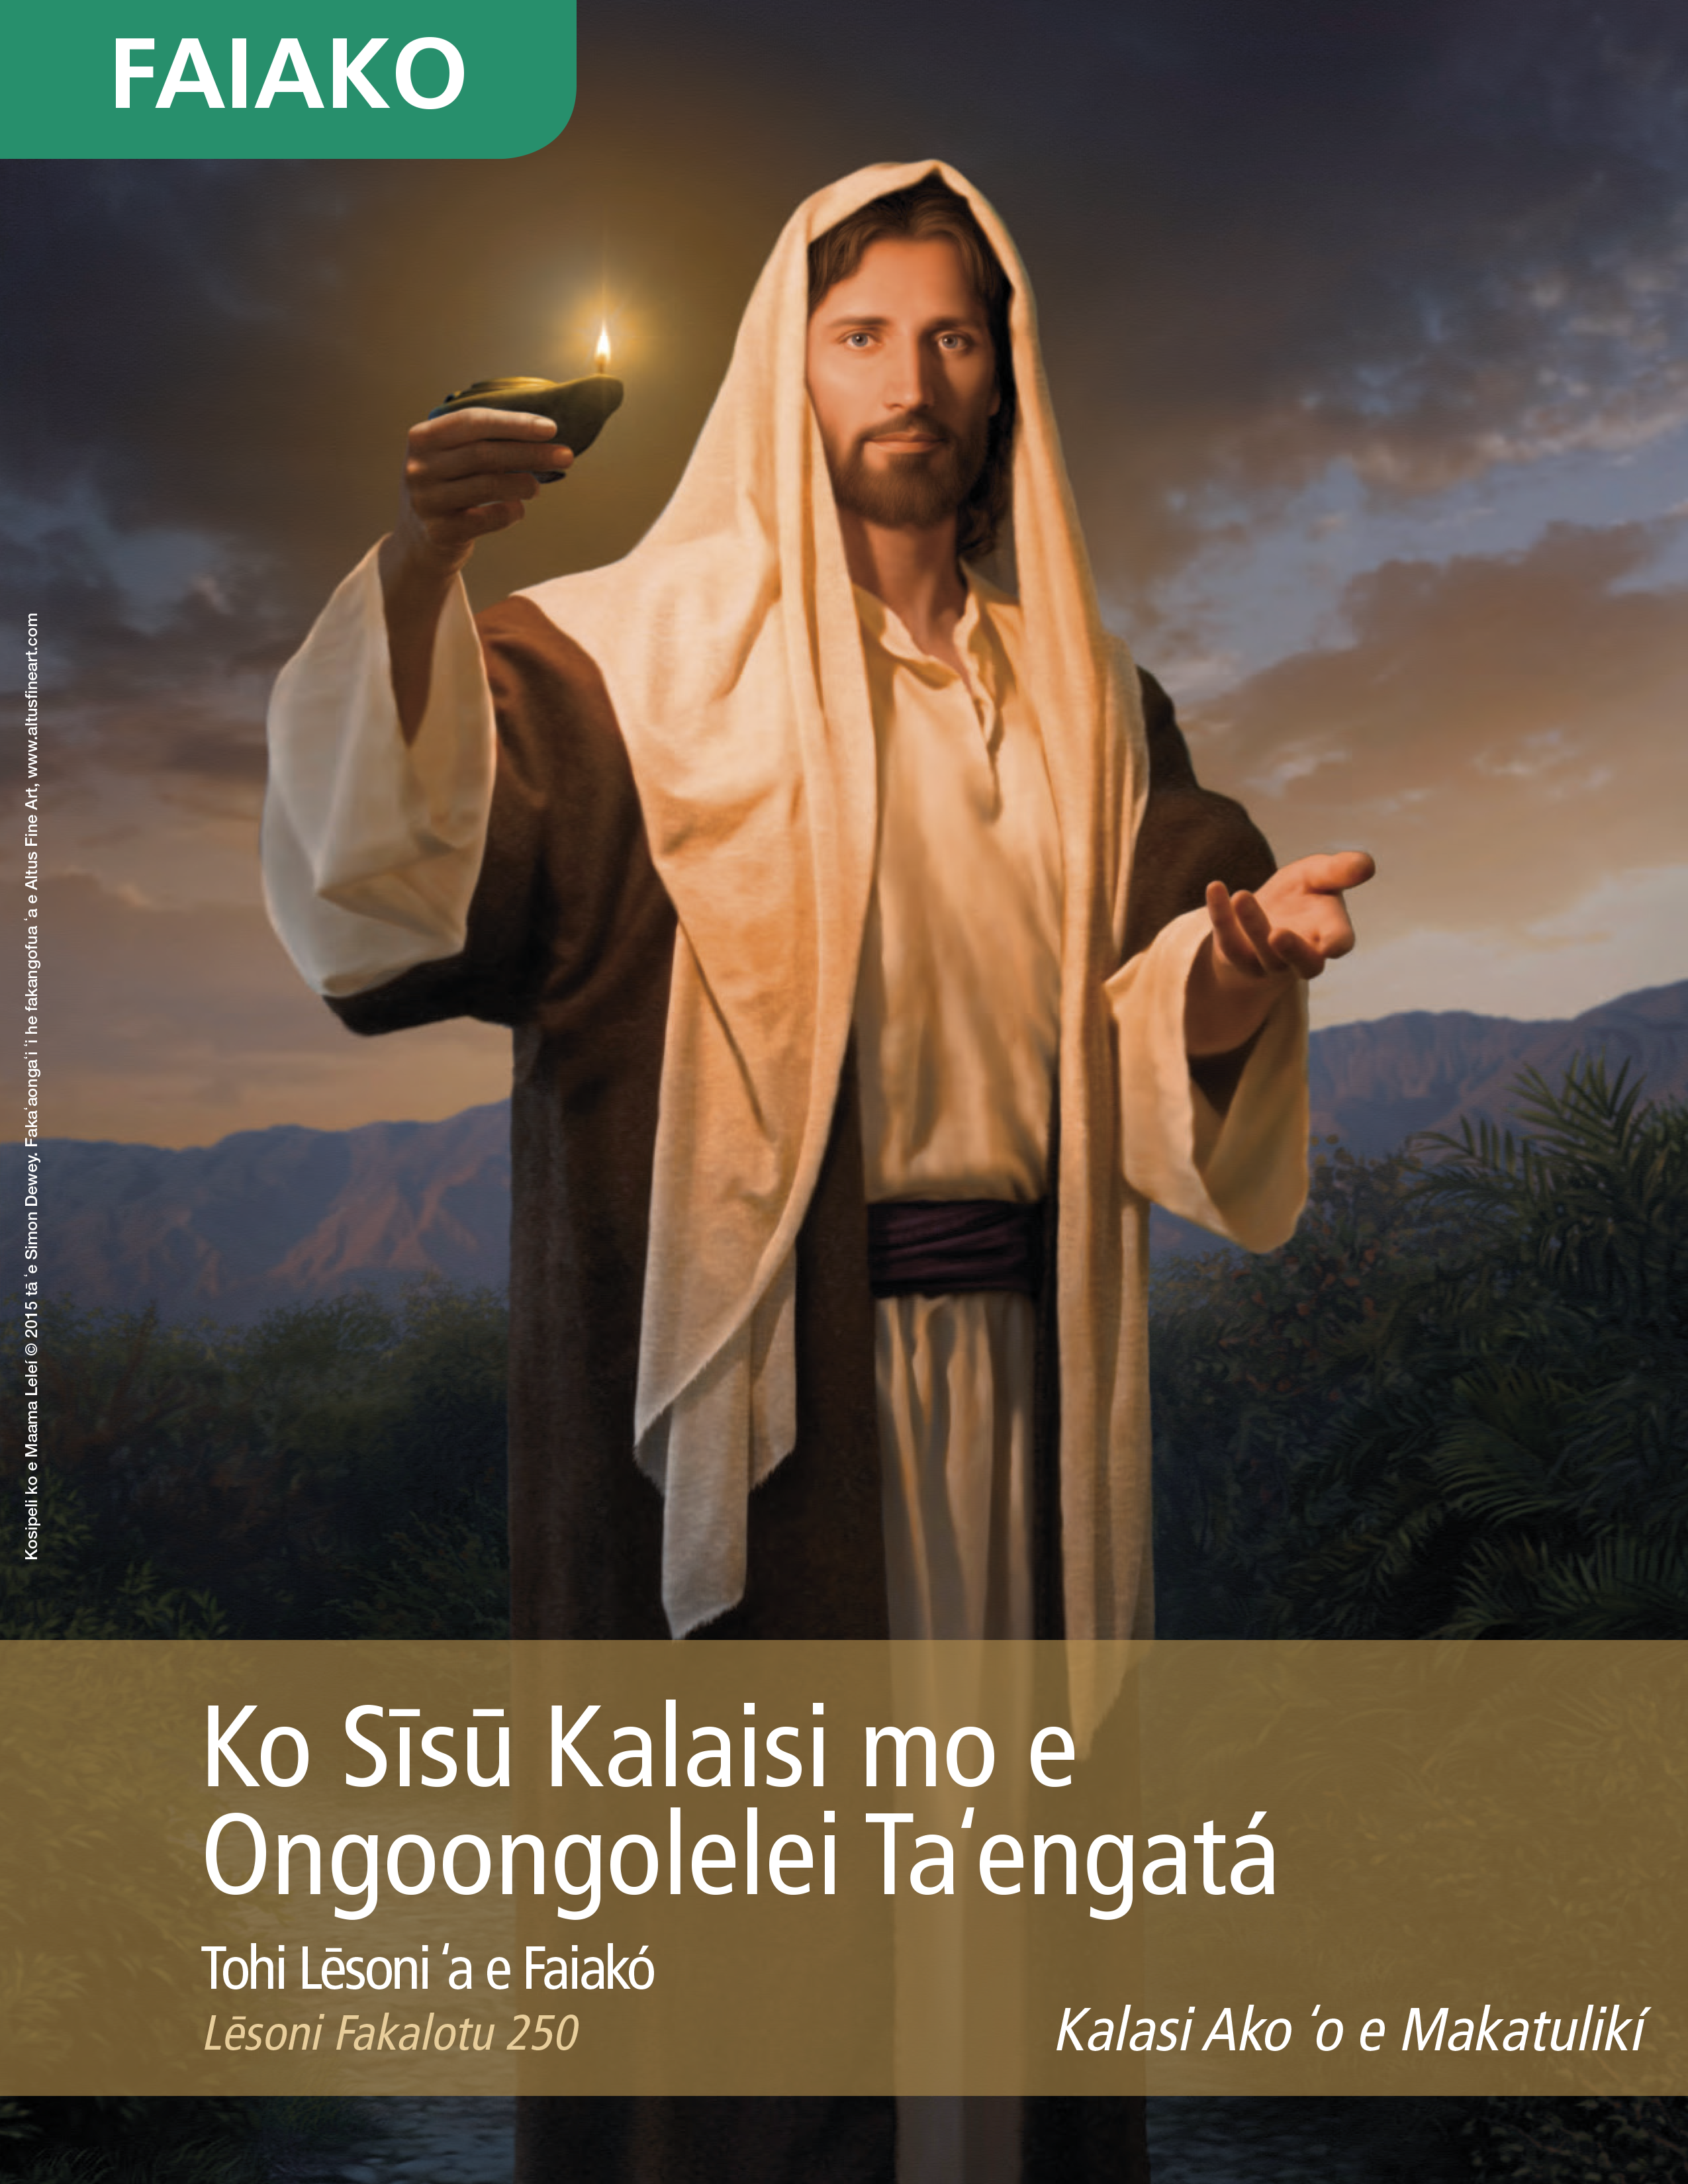 Ko Sīsū Kalaisi mo e Ongoongolelei Taʻengatá - Tohi Lēsoni ʻa e Faiakó (Lēsoni Fakalotu 250)